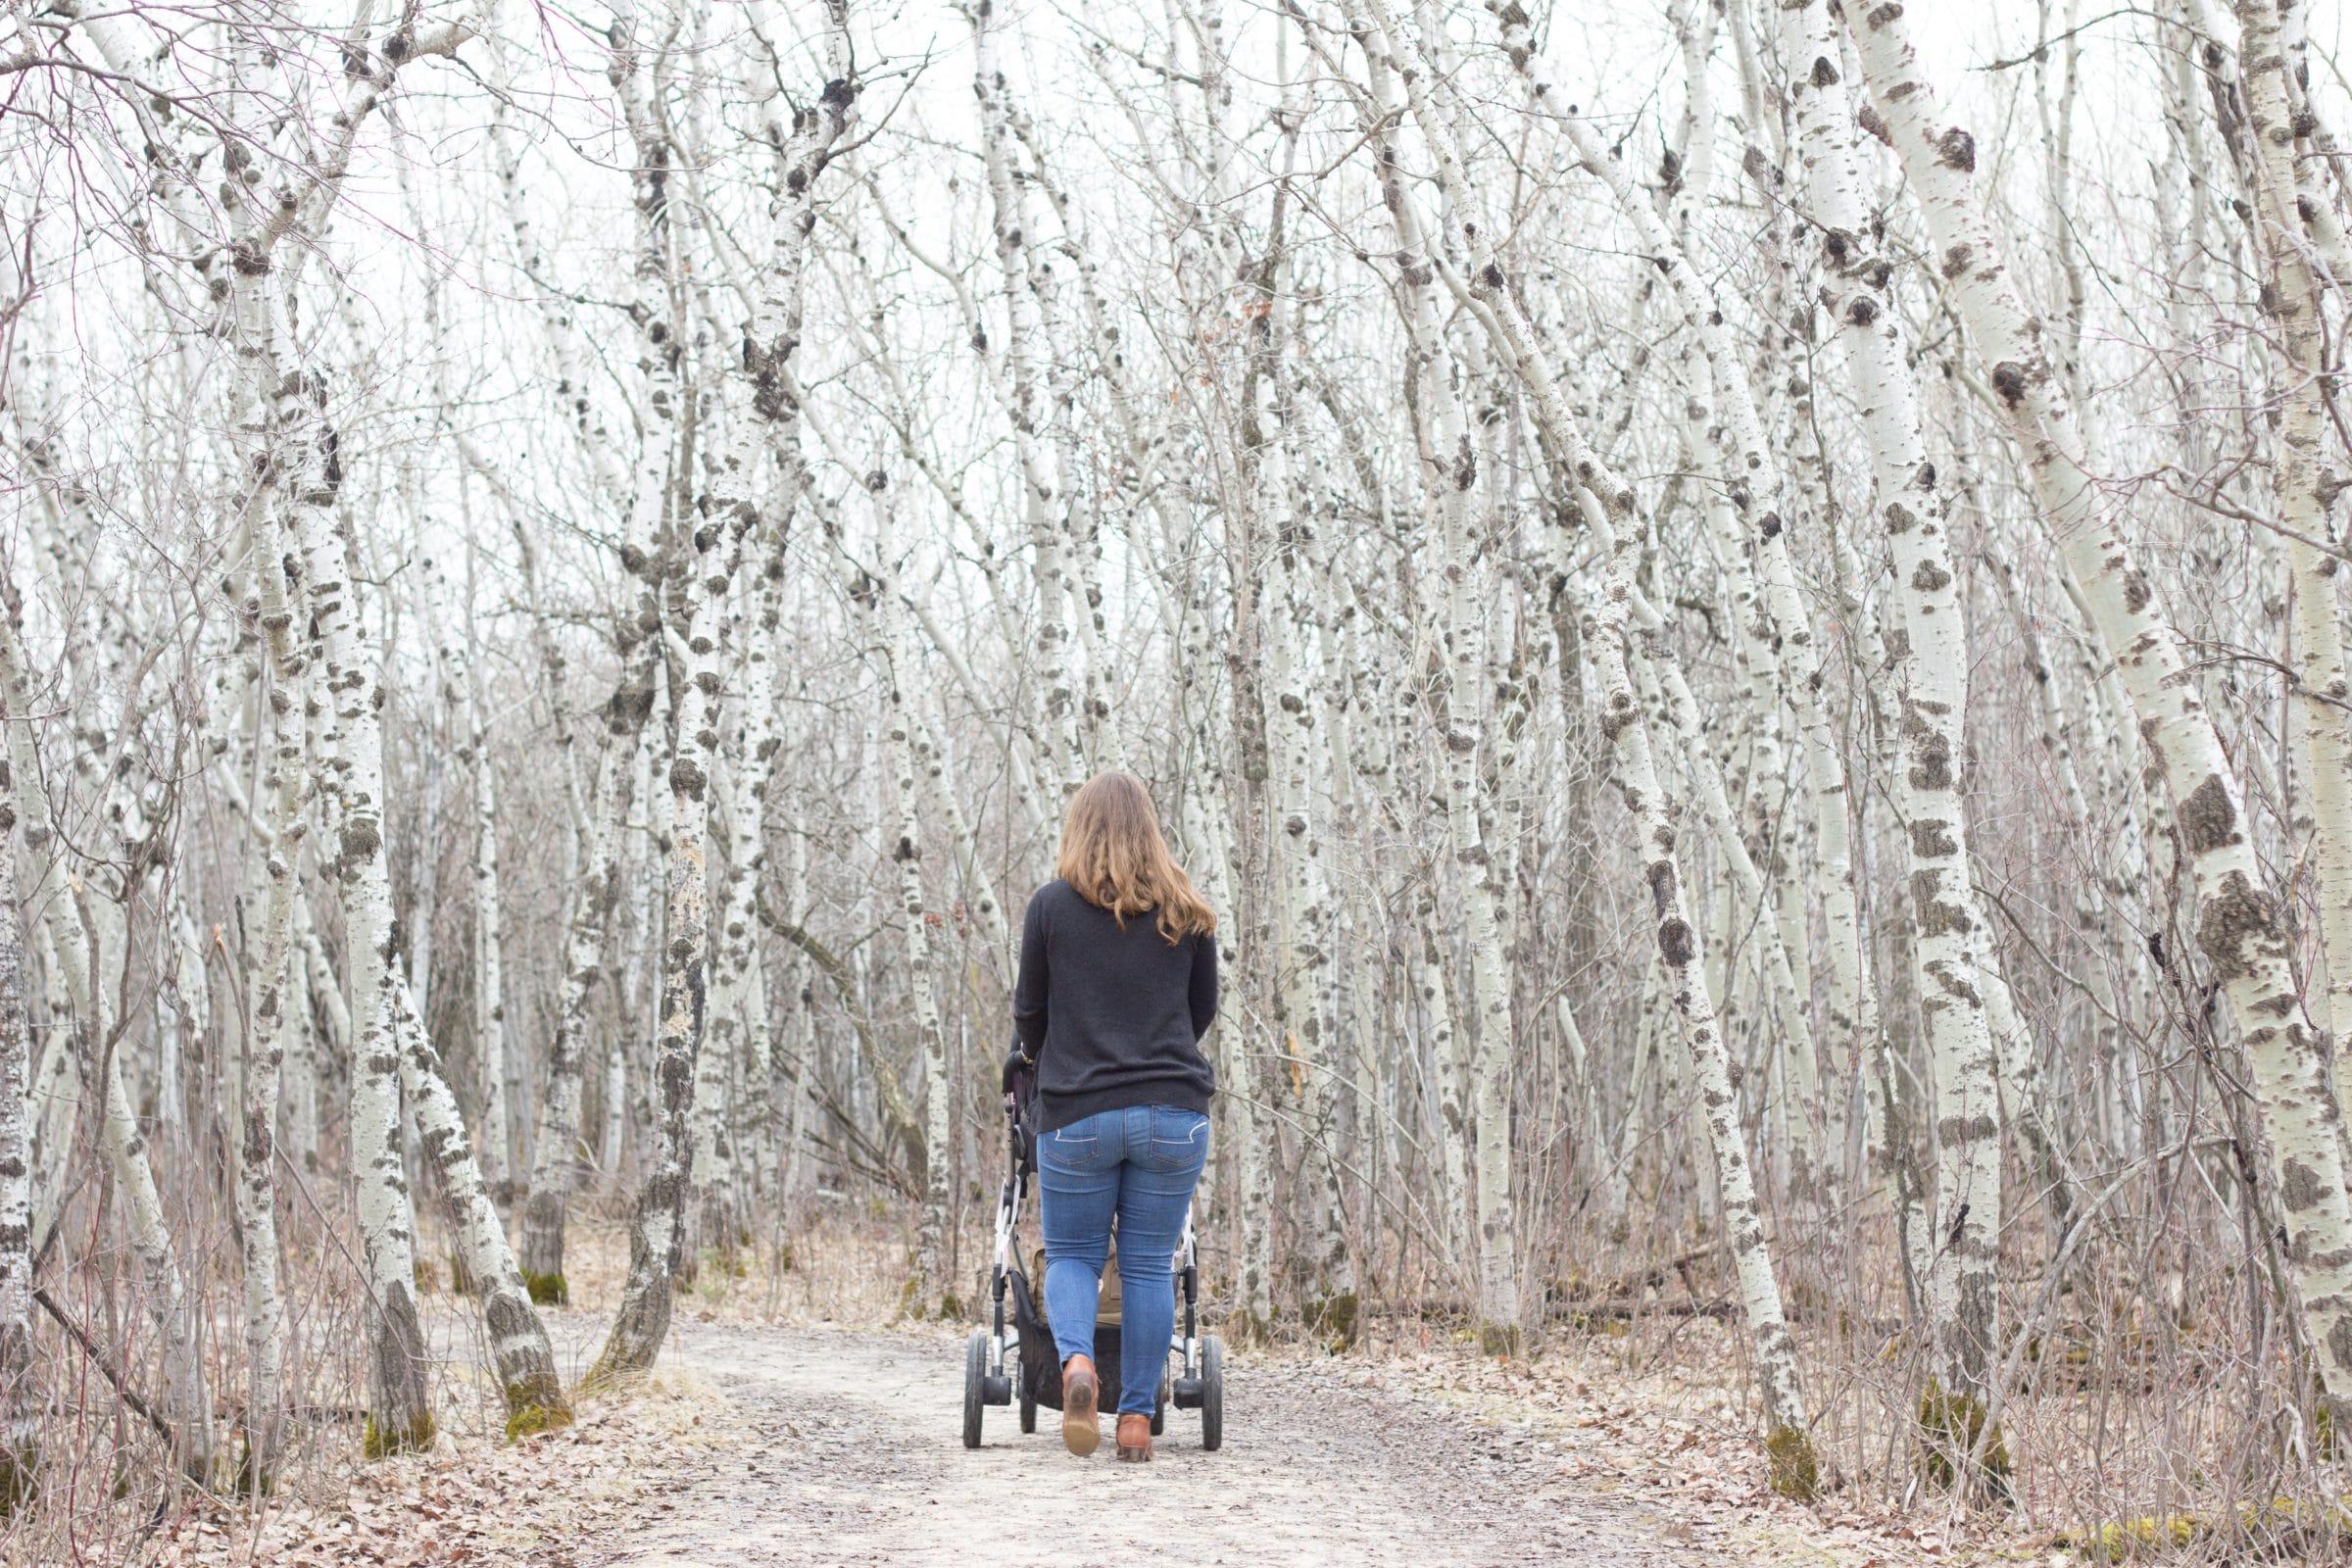 Woman pushing stroller down path in autumn